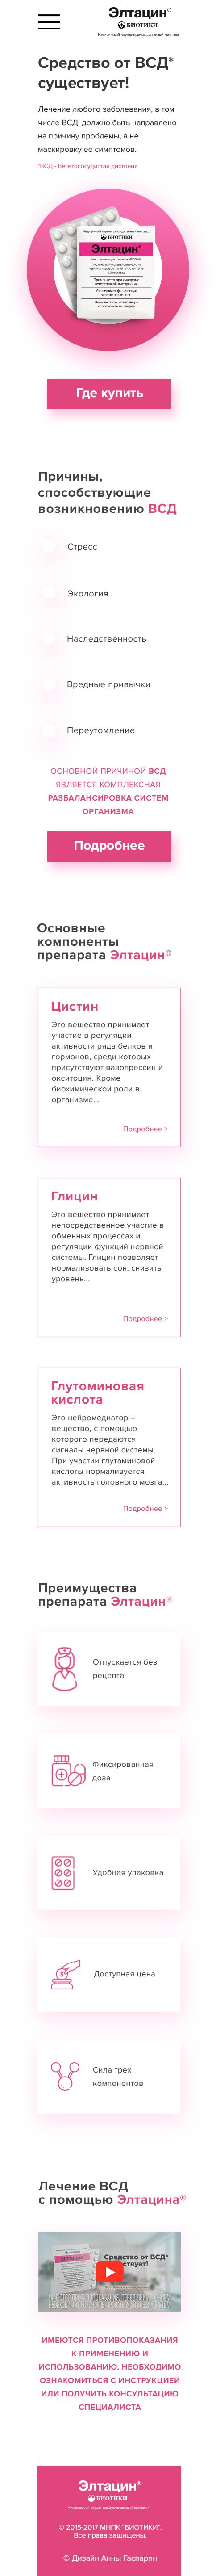 Дизайн главной страницы сайта лекарственного препарата фото f_6765c93639049e4f.png